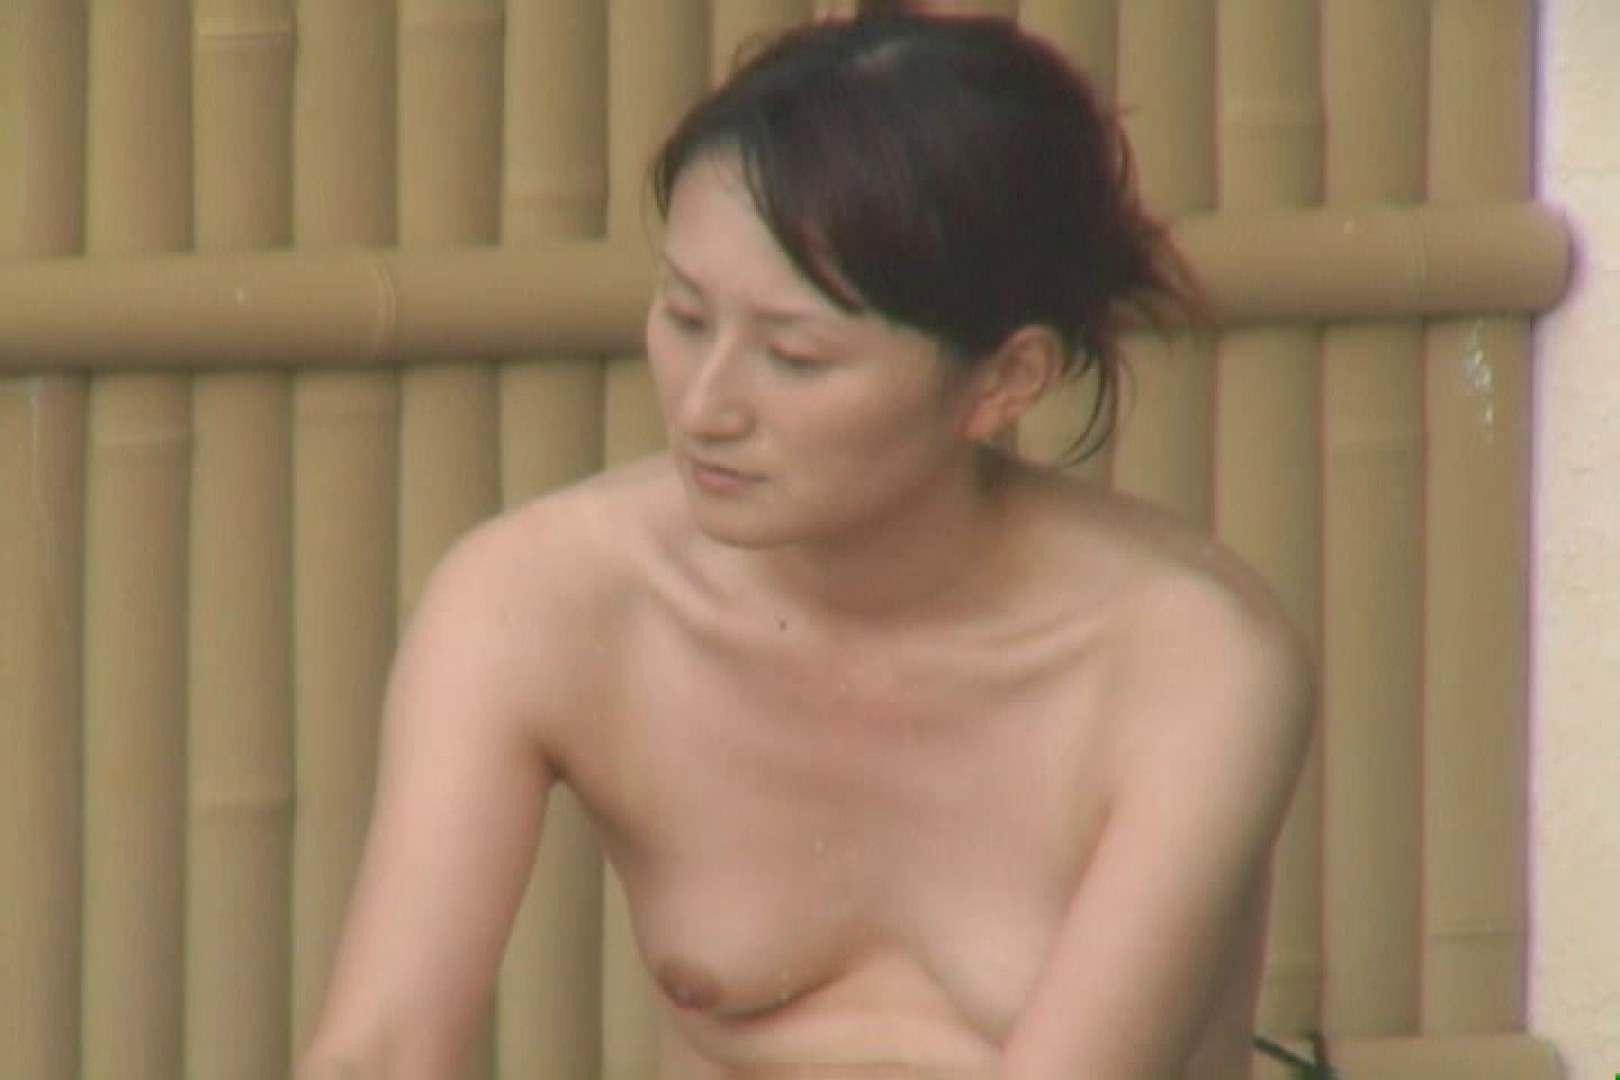 Aquaな露天風呂Vol.578 露天風呂突入 のぞき動画画像 70pic 38